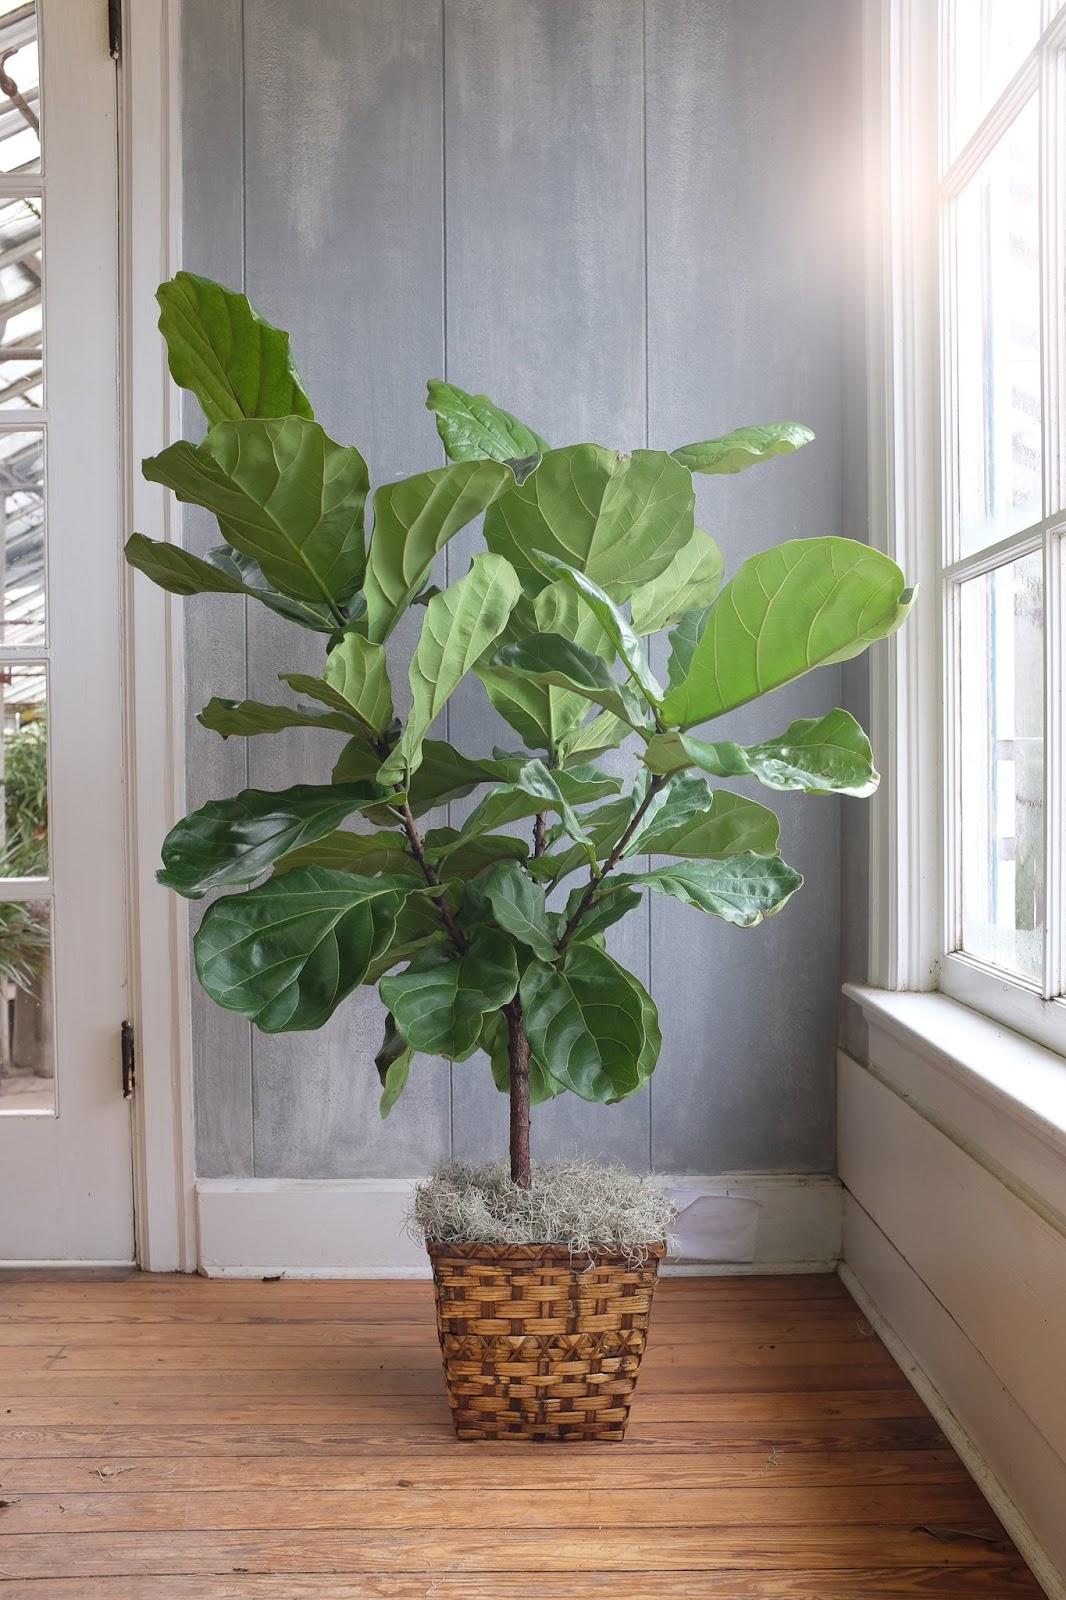 Tanaman hias fiddle leaf fig (ara biola/kimunding) - source: michlers.com